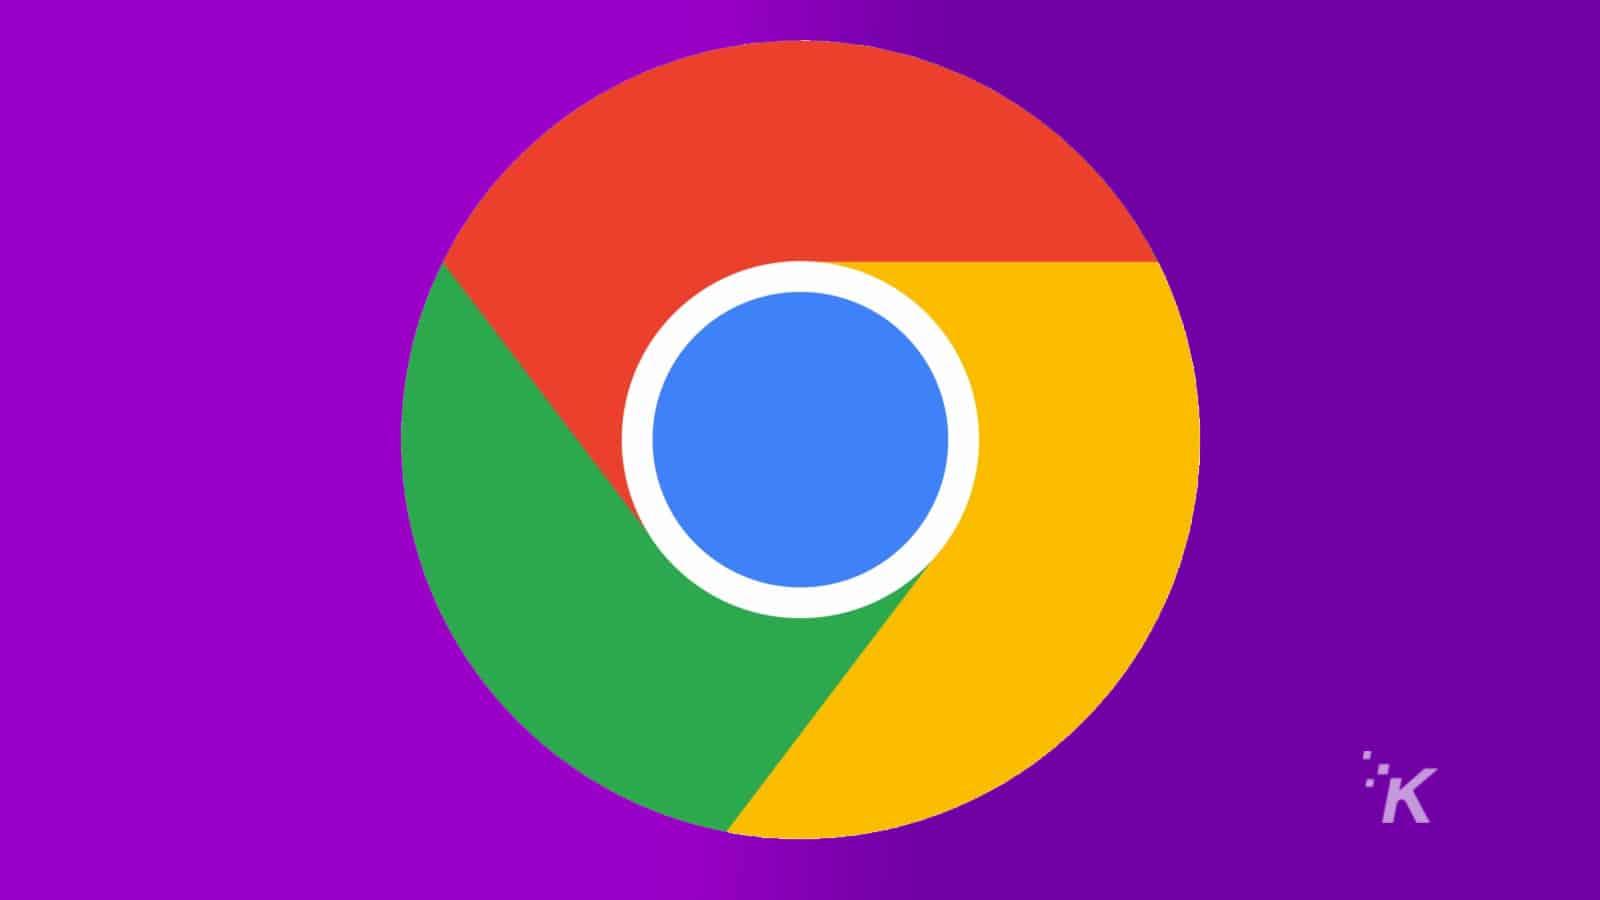 google chrome logo on purple background